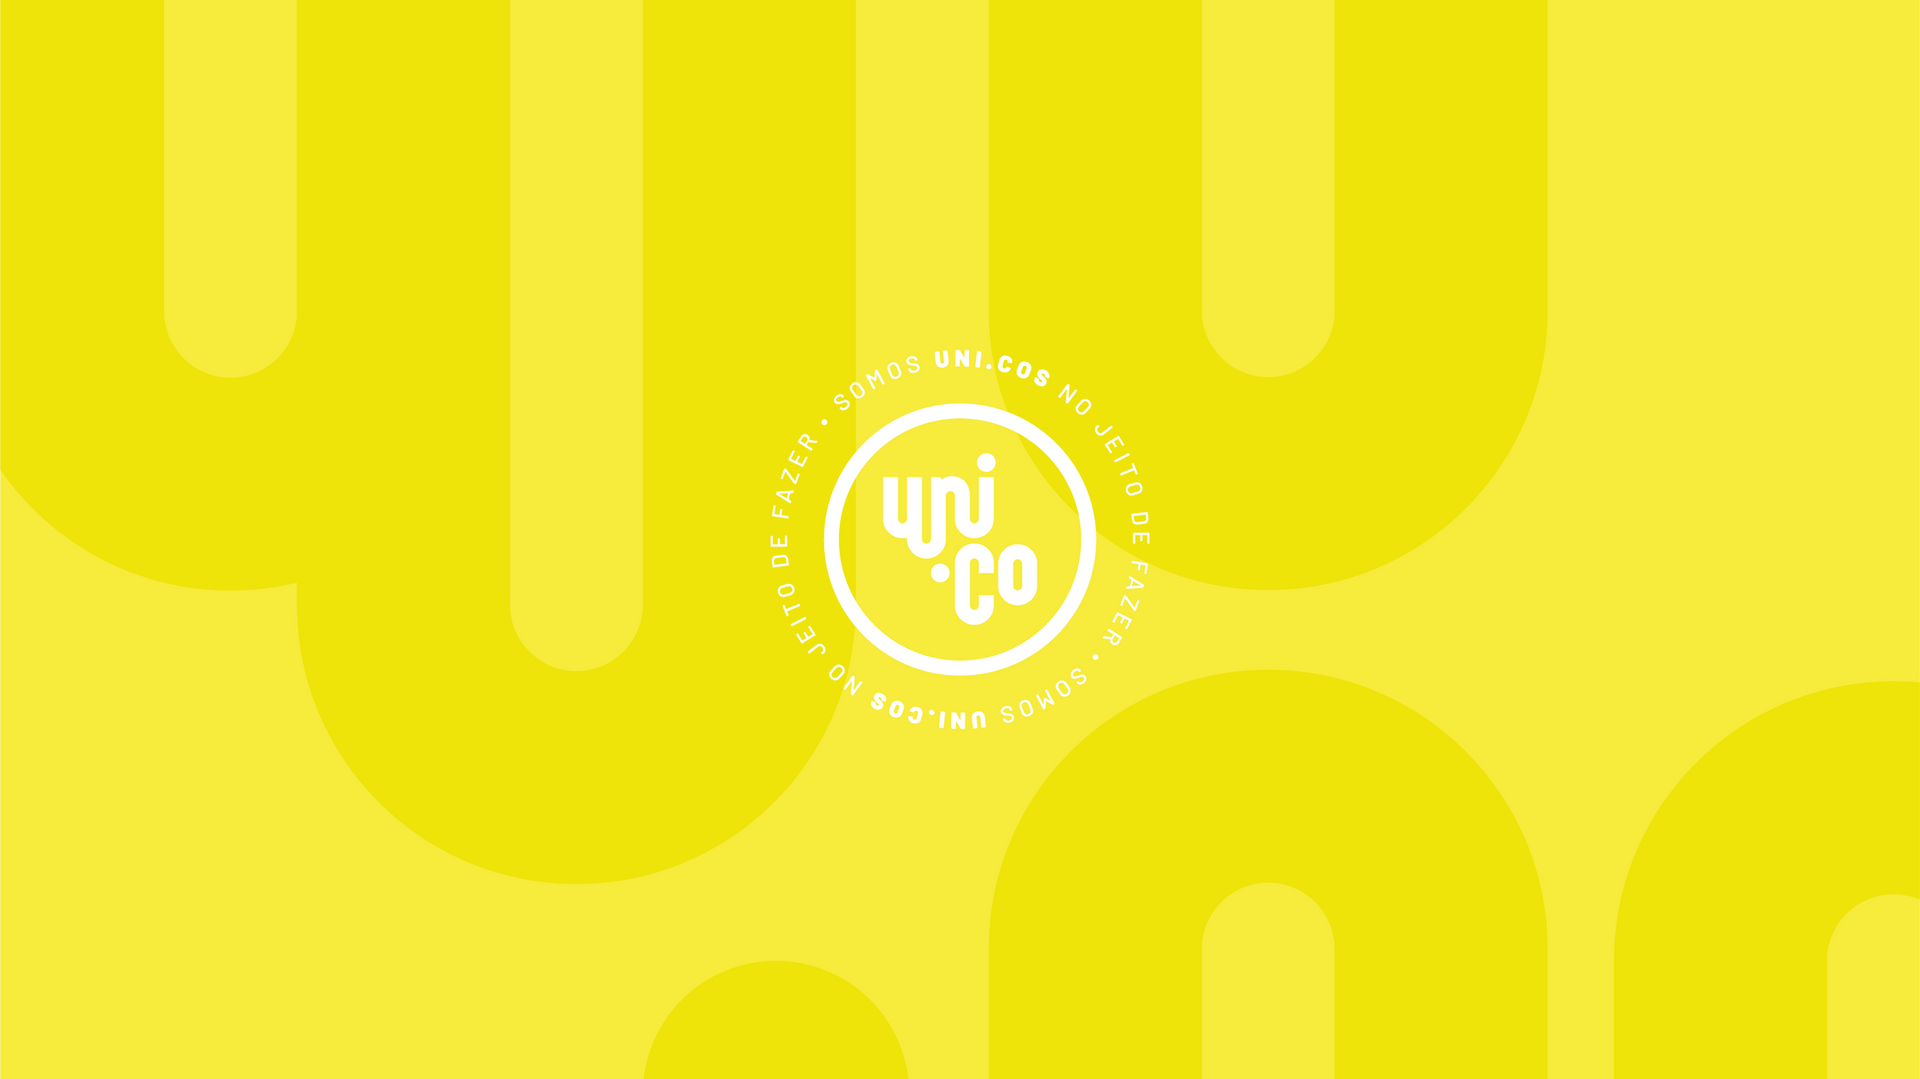 Grupo Uni.co | Branding